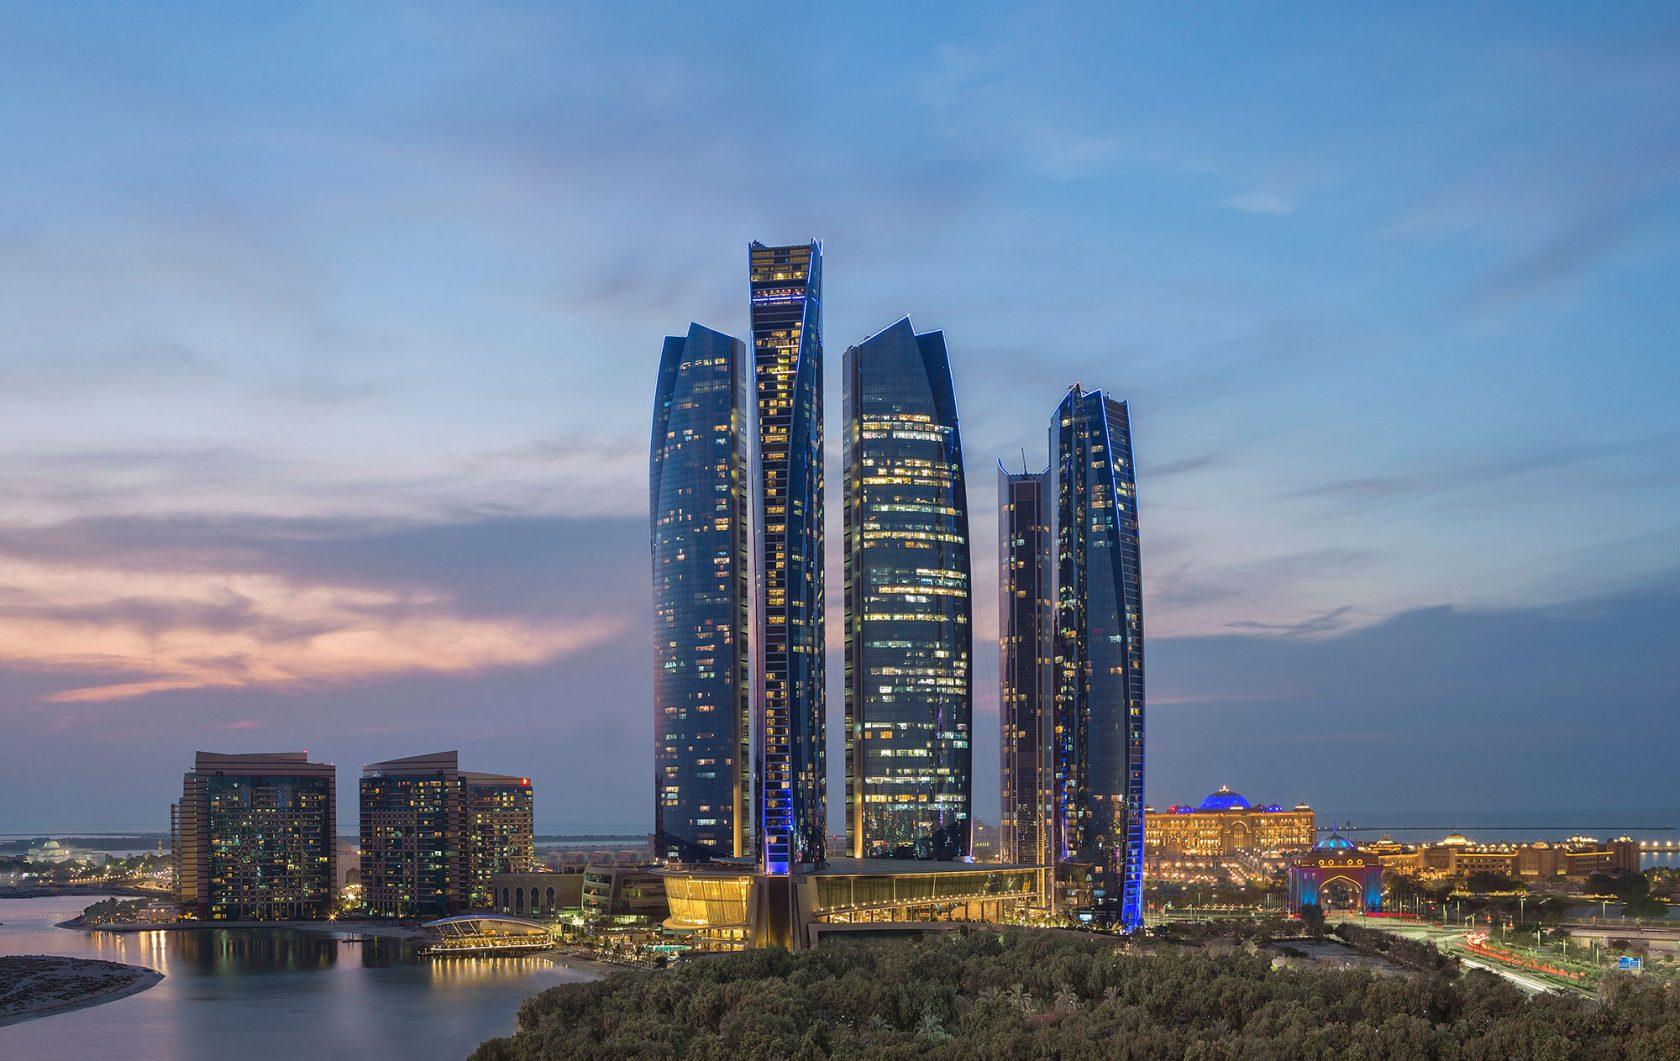 Conrad Abu Dhabi Etihad Towers Tower shot